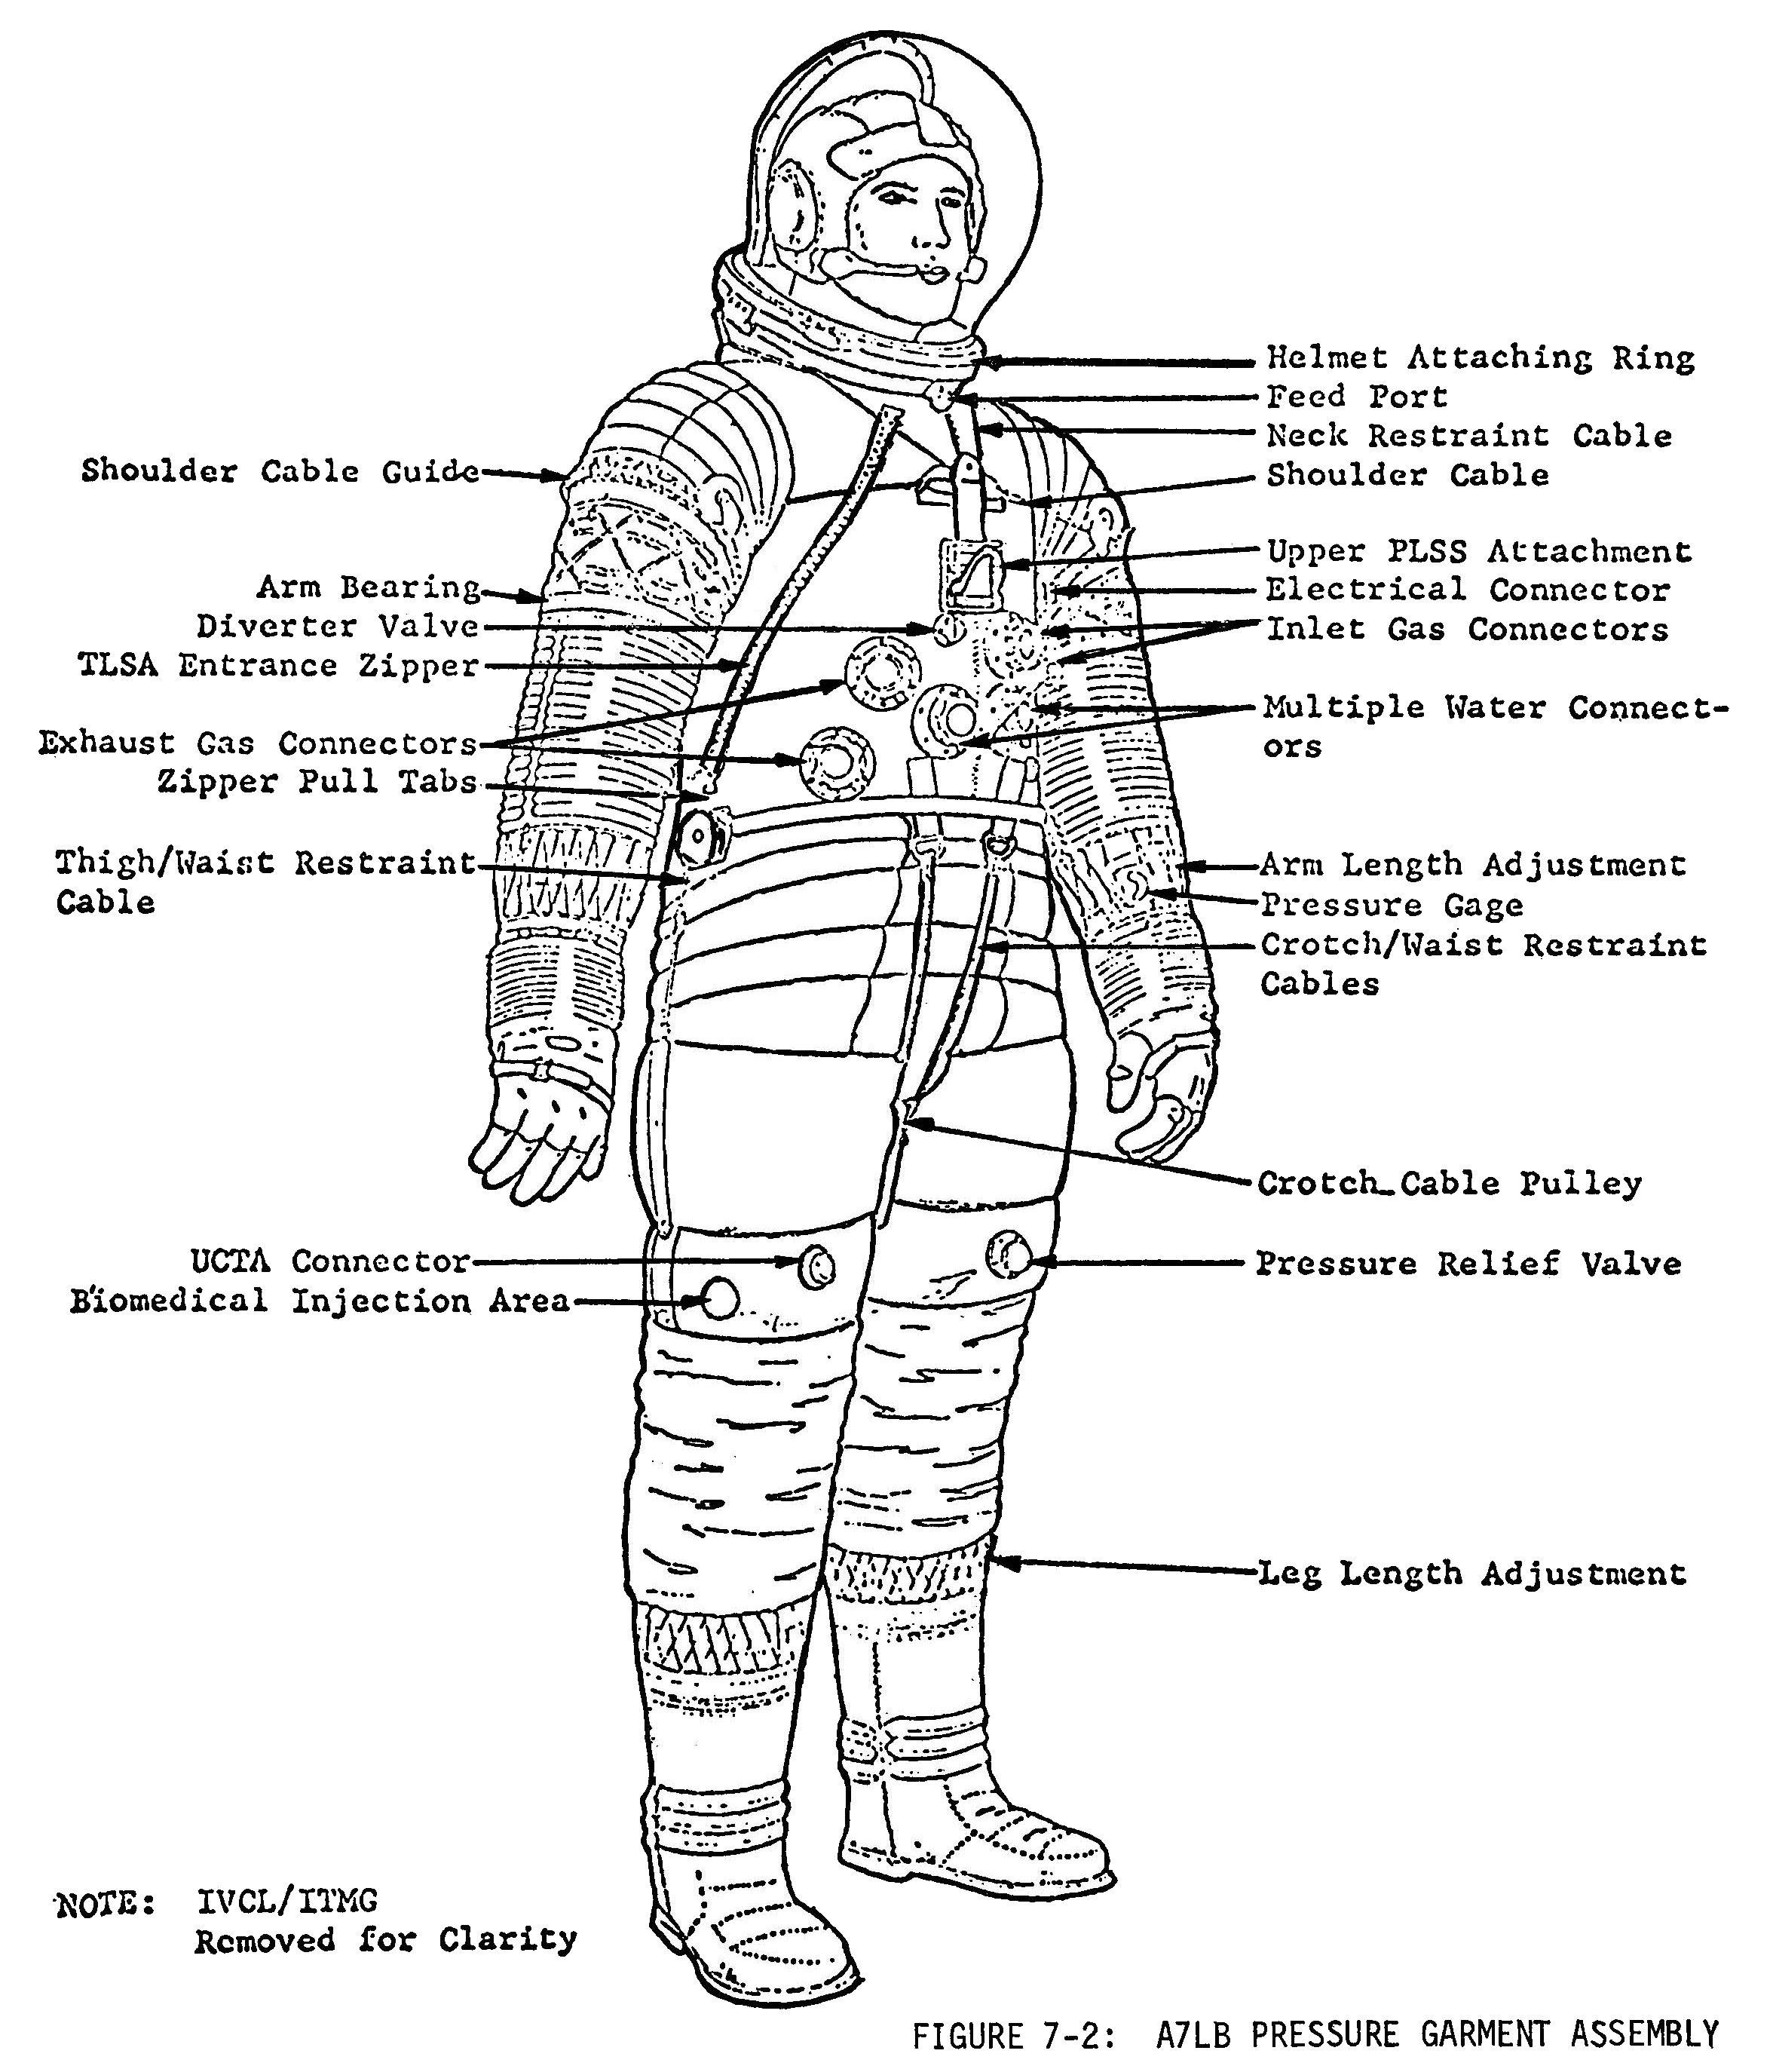 97fabb1ffeb46a82d611b2506c310f04 pin by michael houghton on robots, aliens, astronauts, rockets